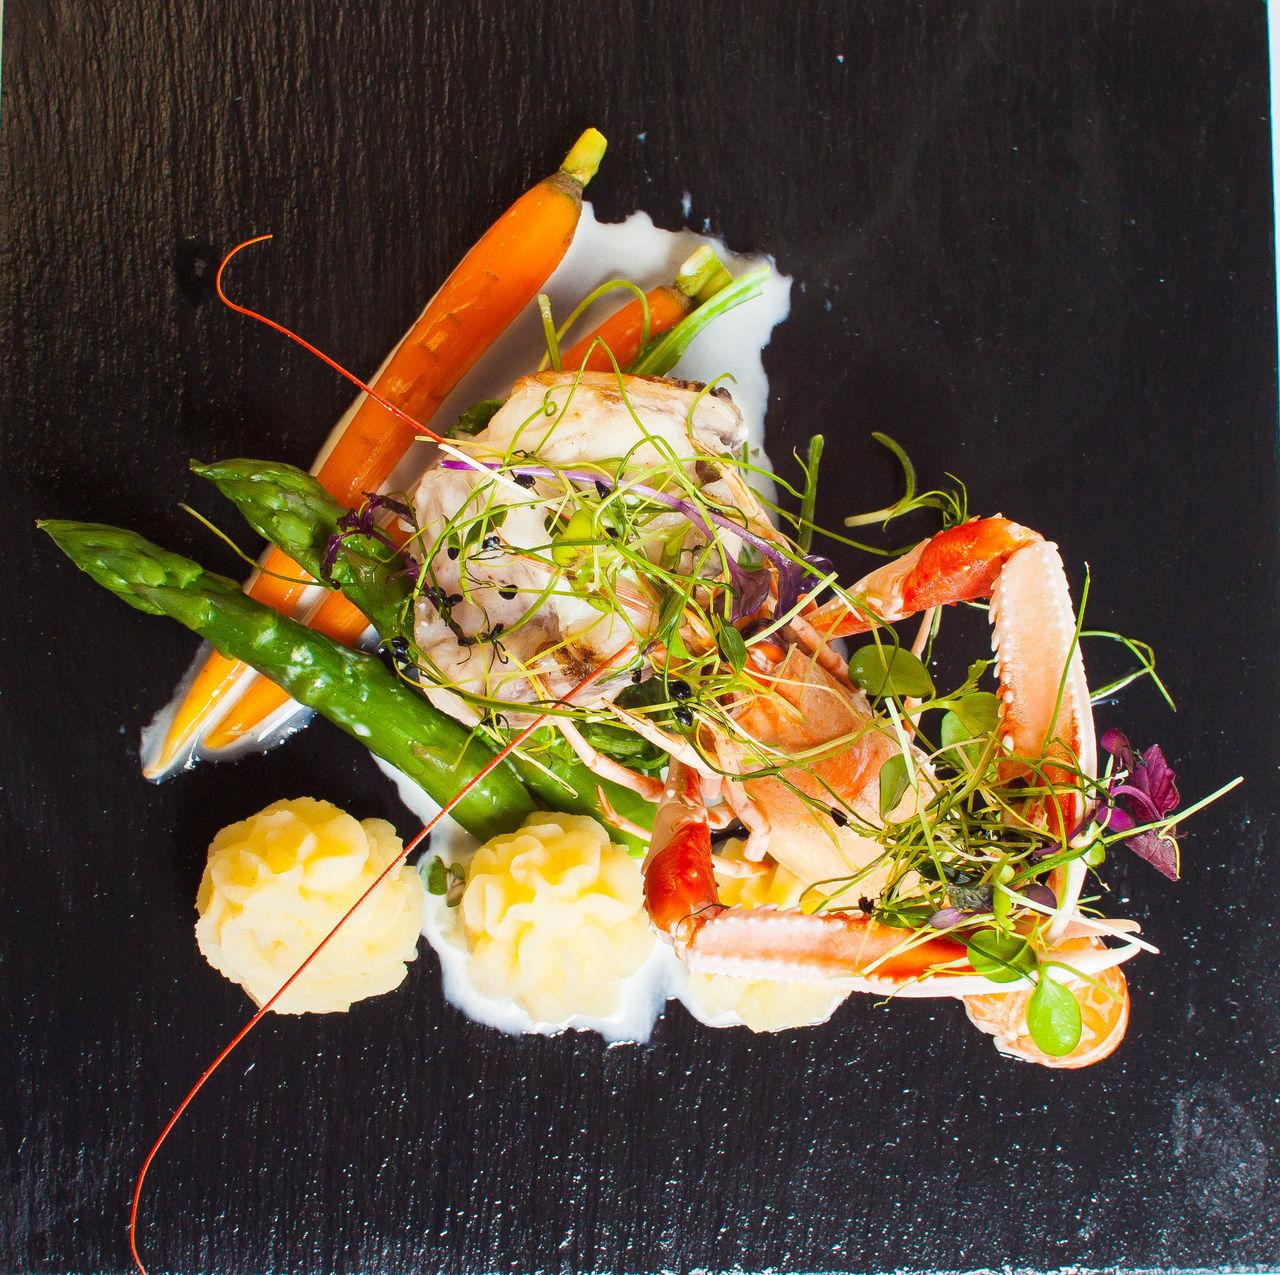 Comida Cooking Dish Eat Food Hospitalitylife Hosteleria Manu Marisco Platos Sea Seafood Vegetable